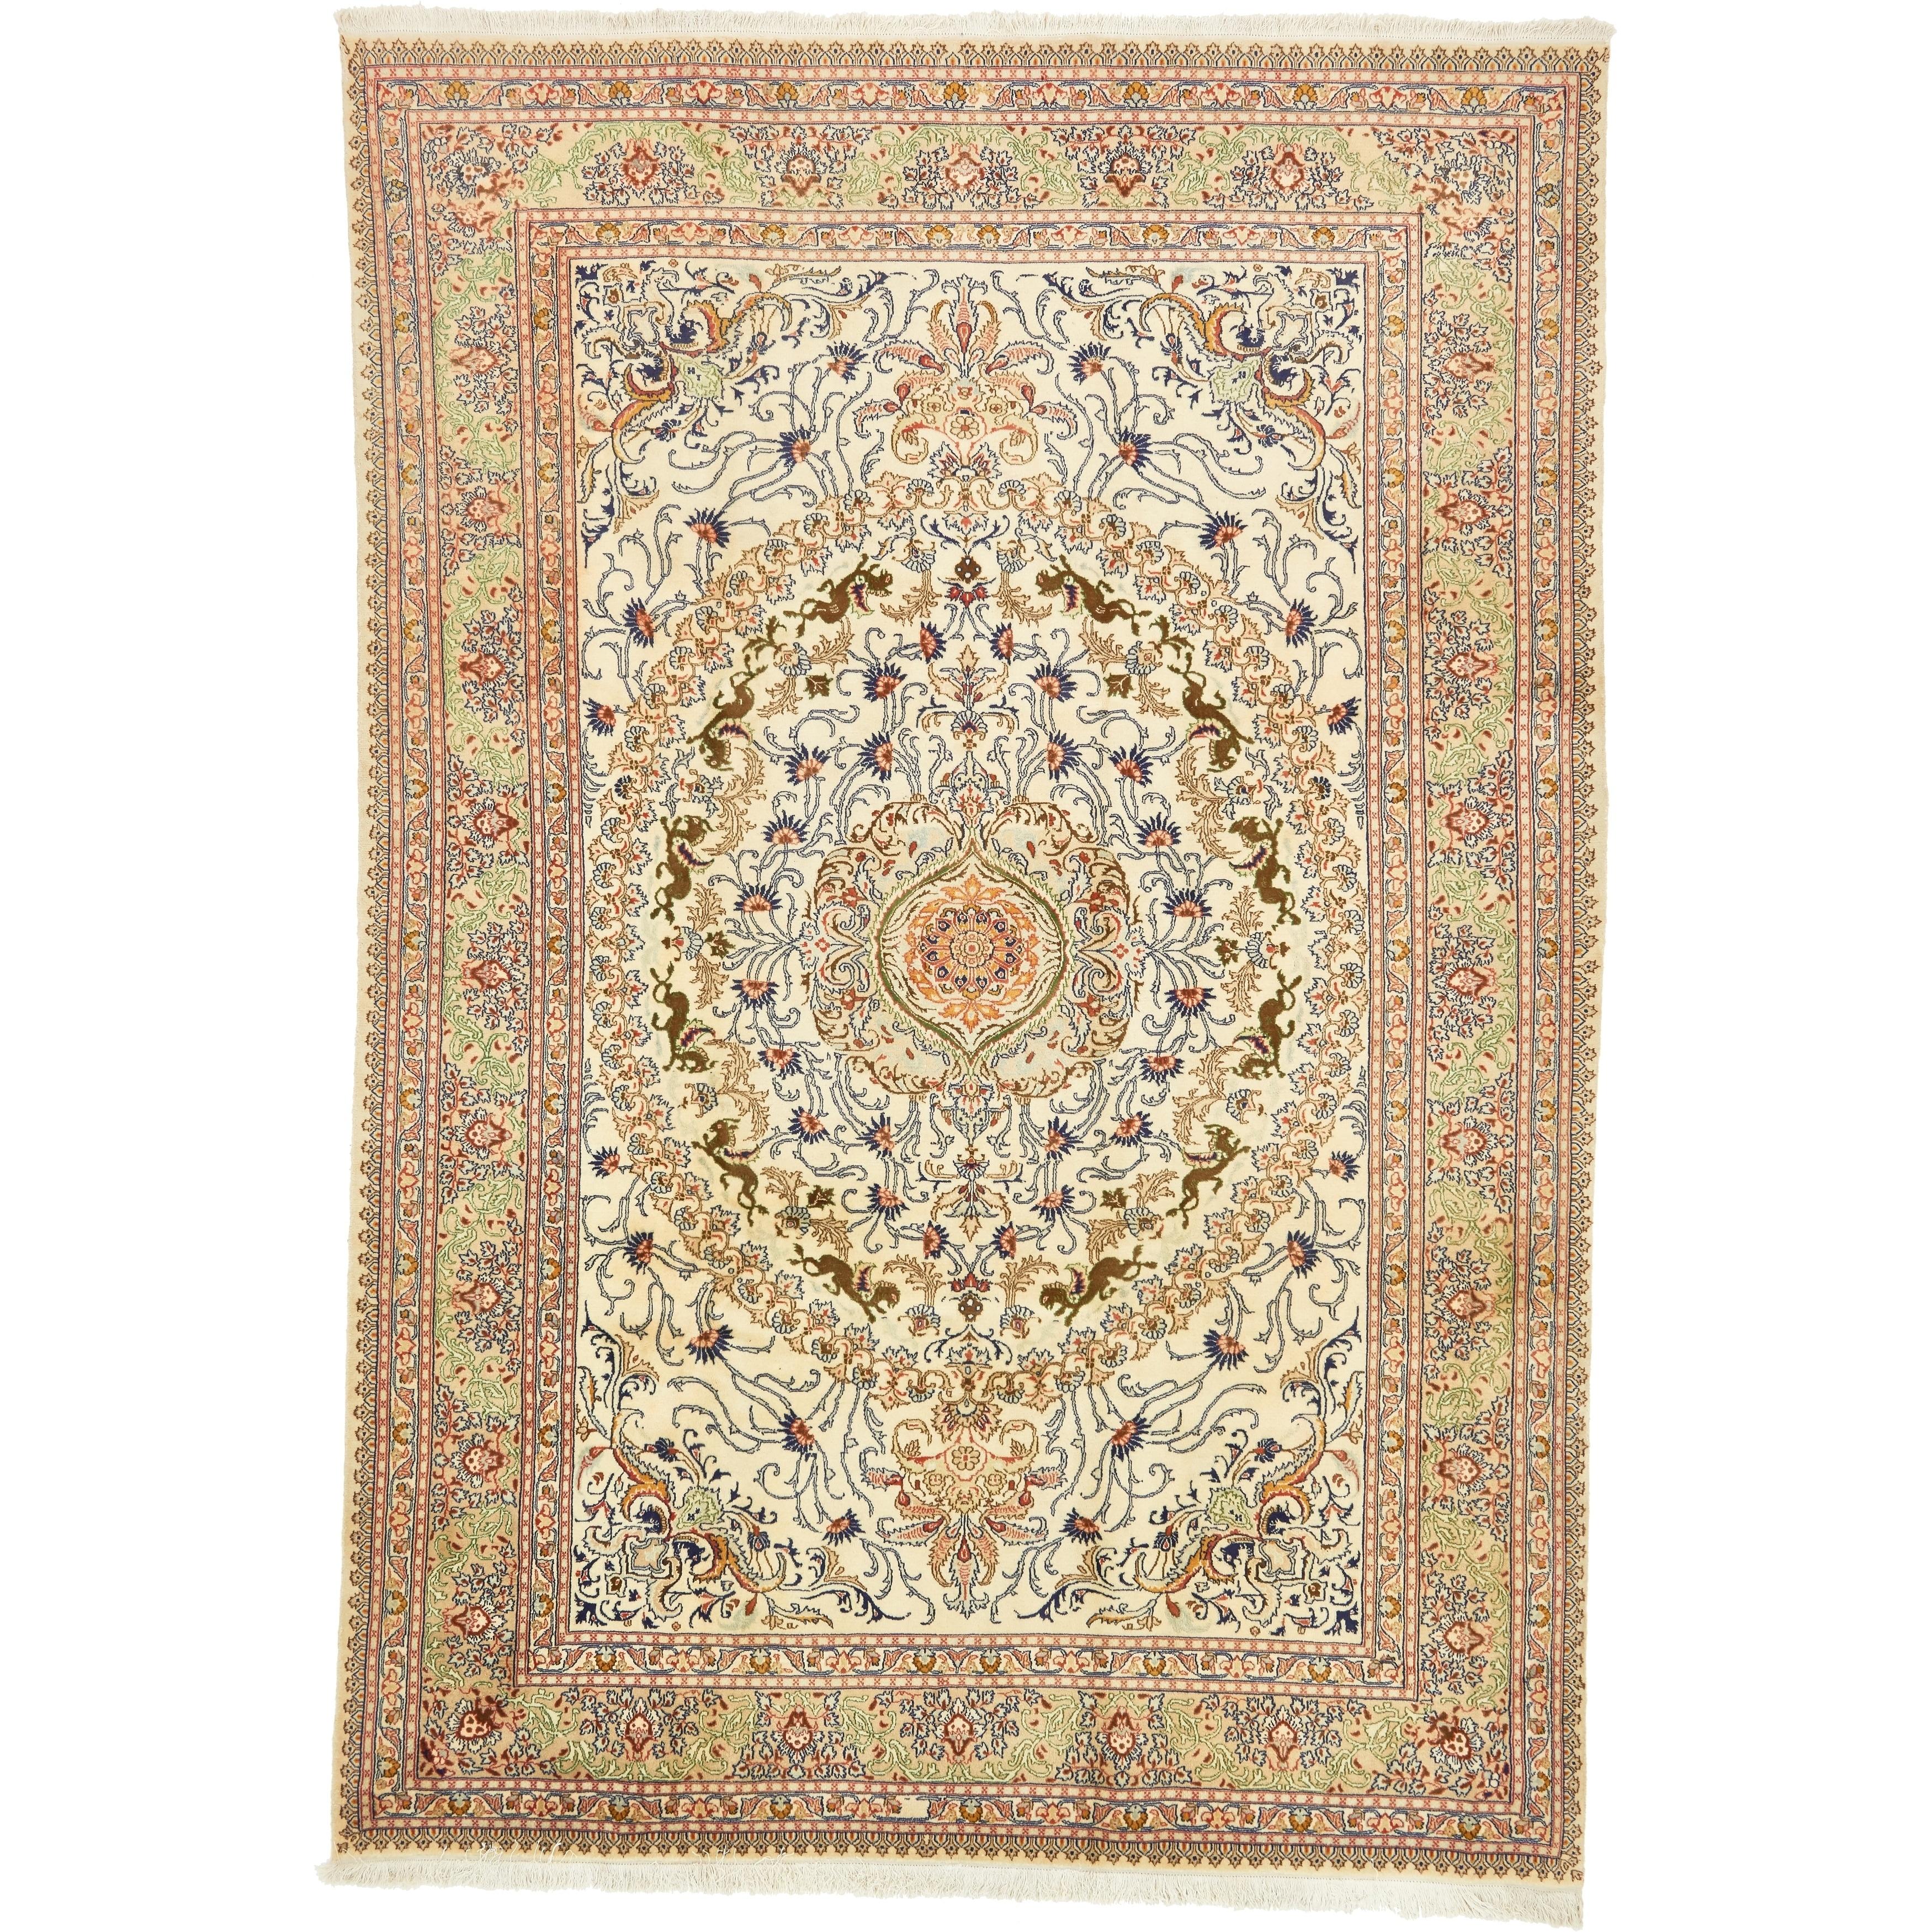 Hand Knotted Kashmar Kork Wool Area Rug - 8 x 11 7 (Ivory - 8 x 11 7)